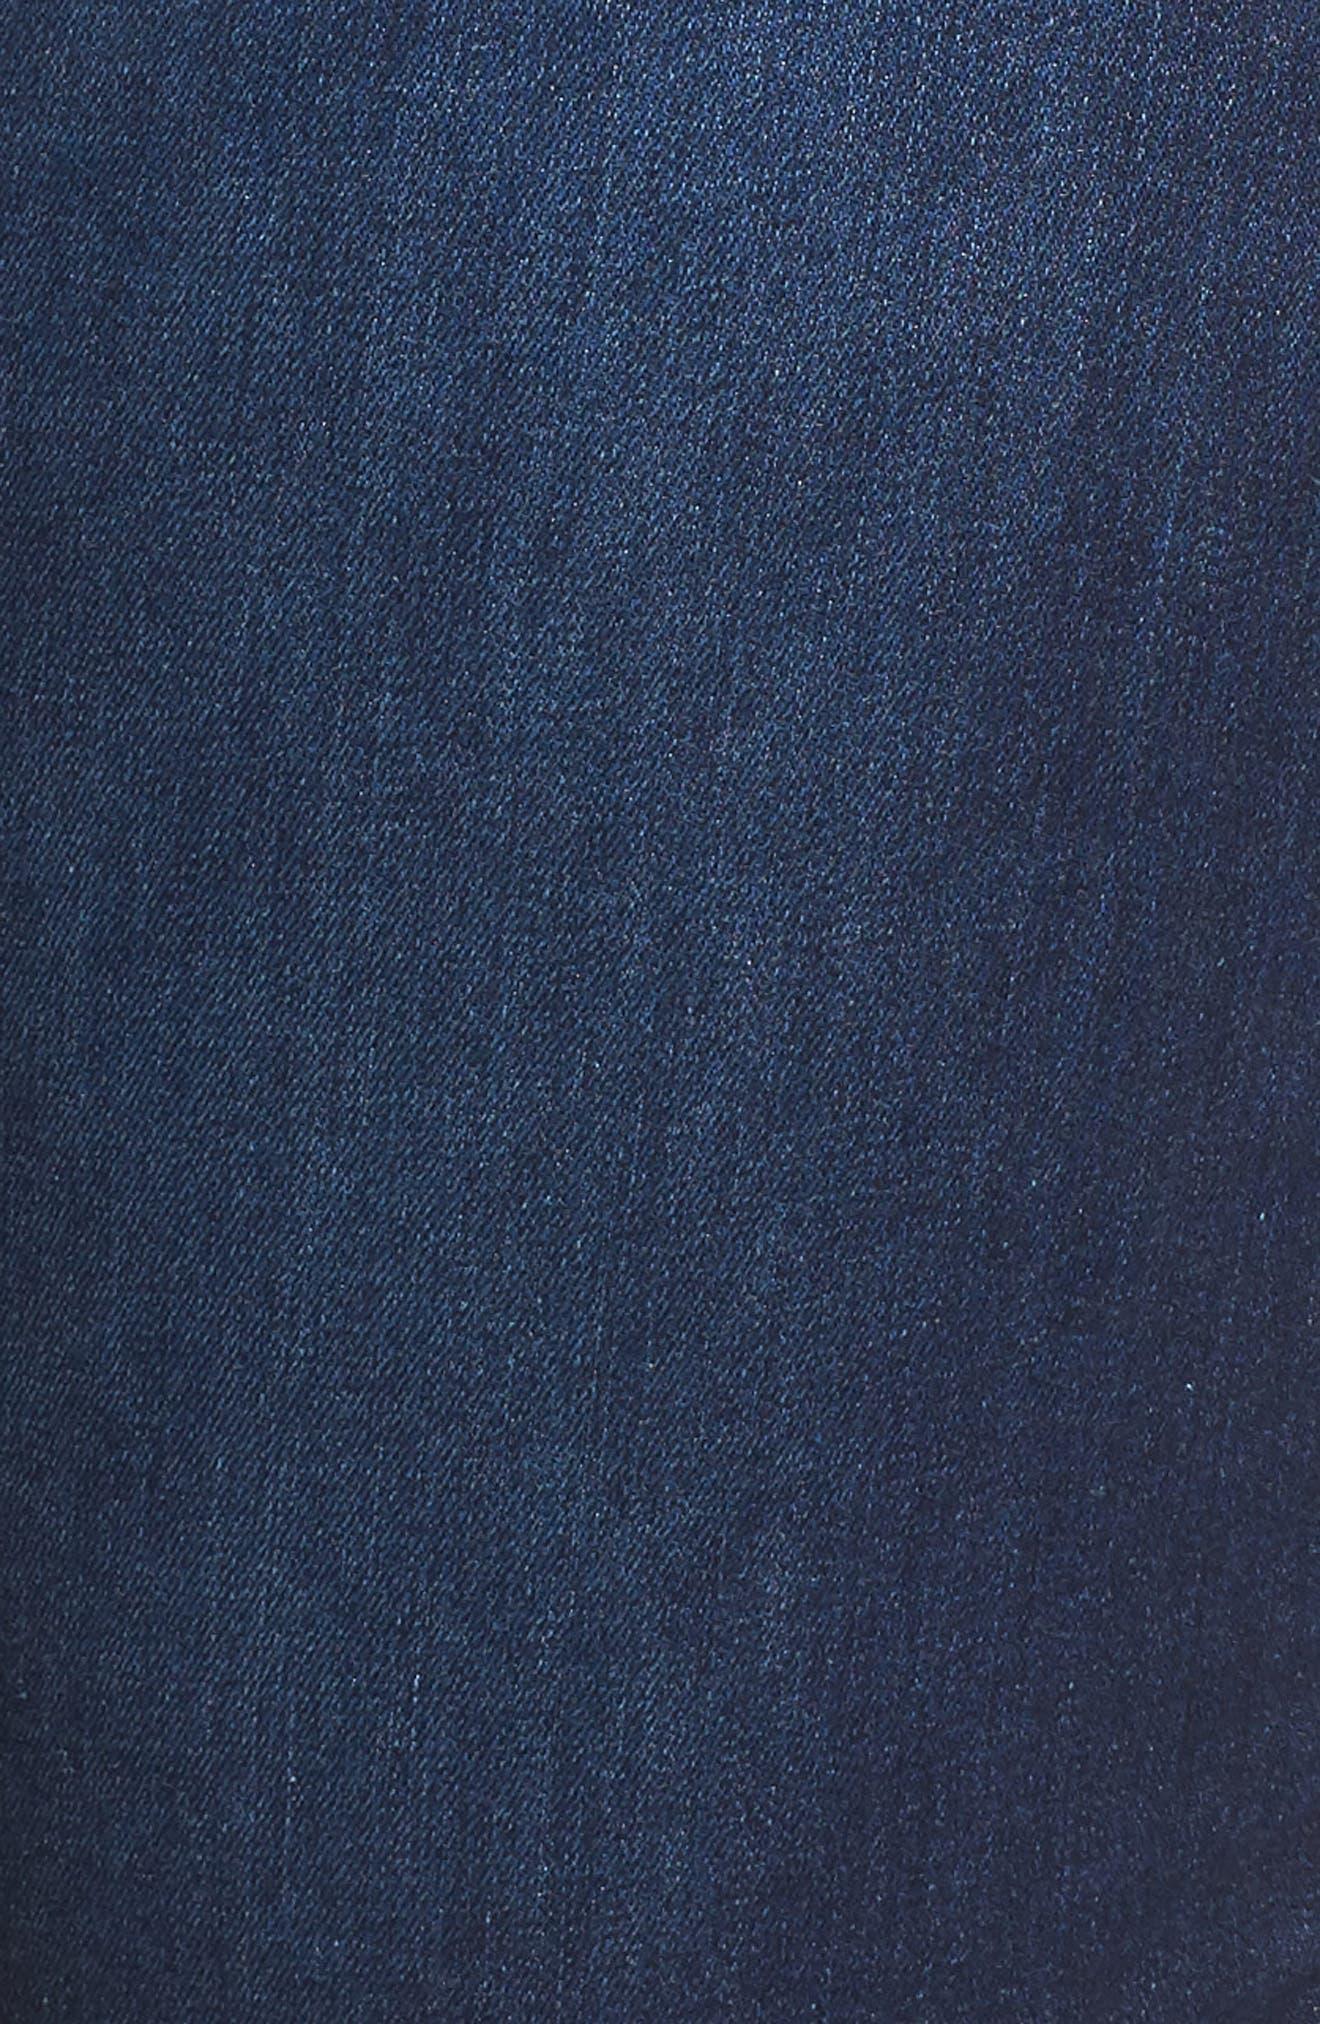 Briella Fray Hem Denim Bermuda Shorts,                             Alternate thumbnail 9, color,